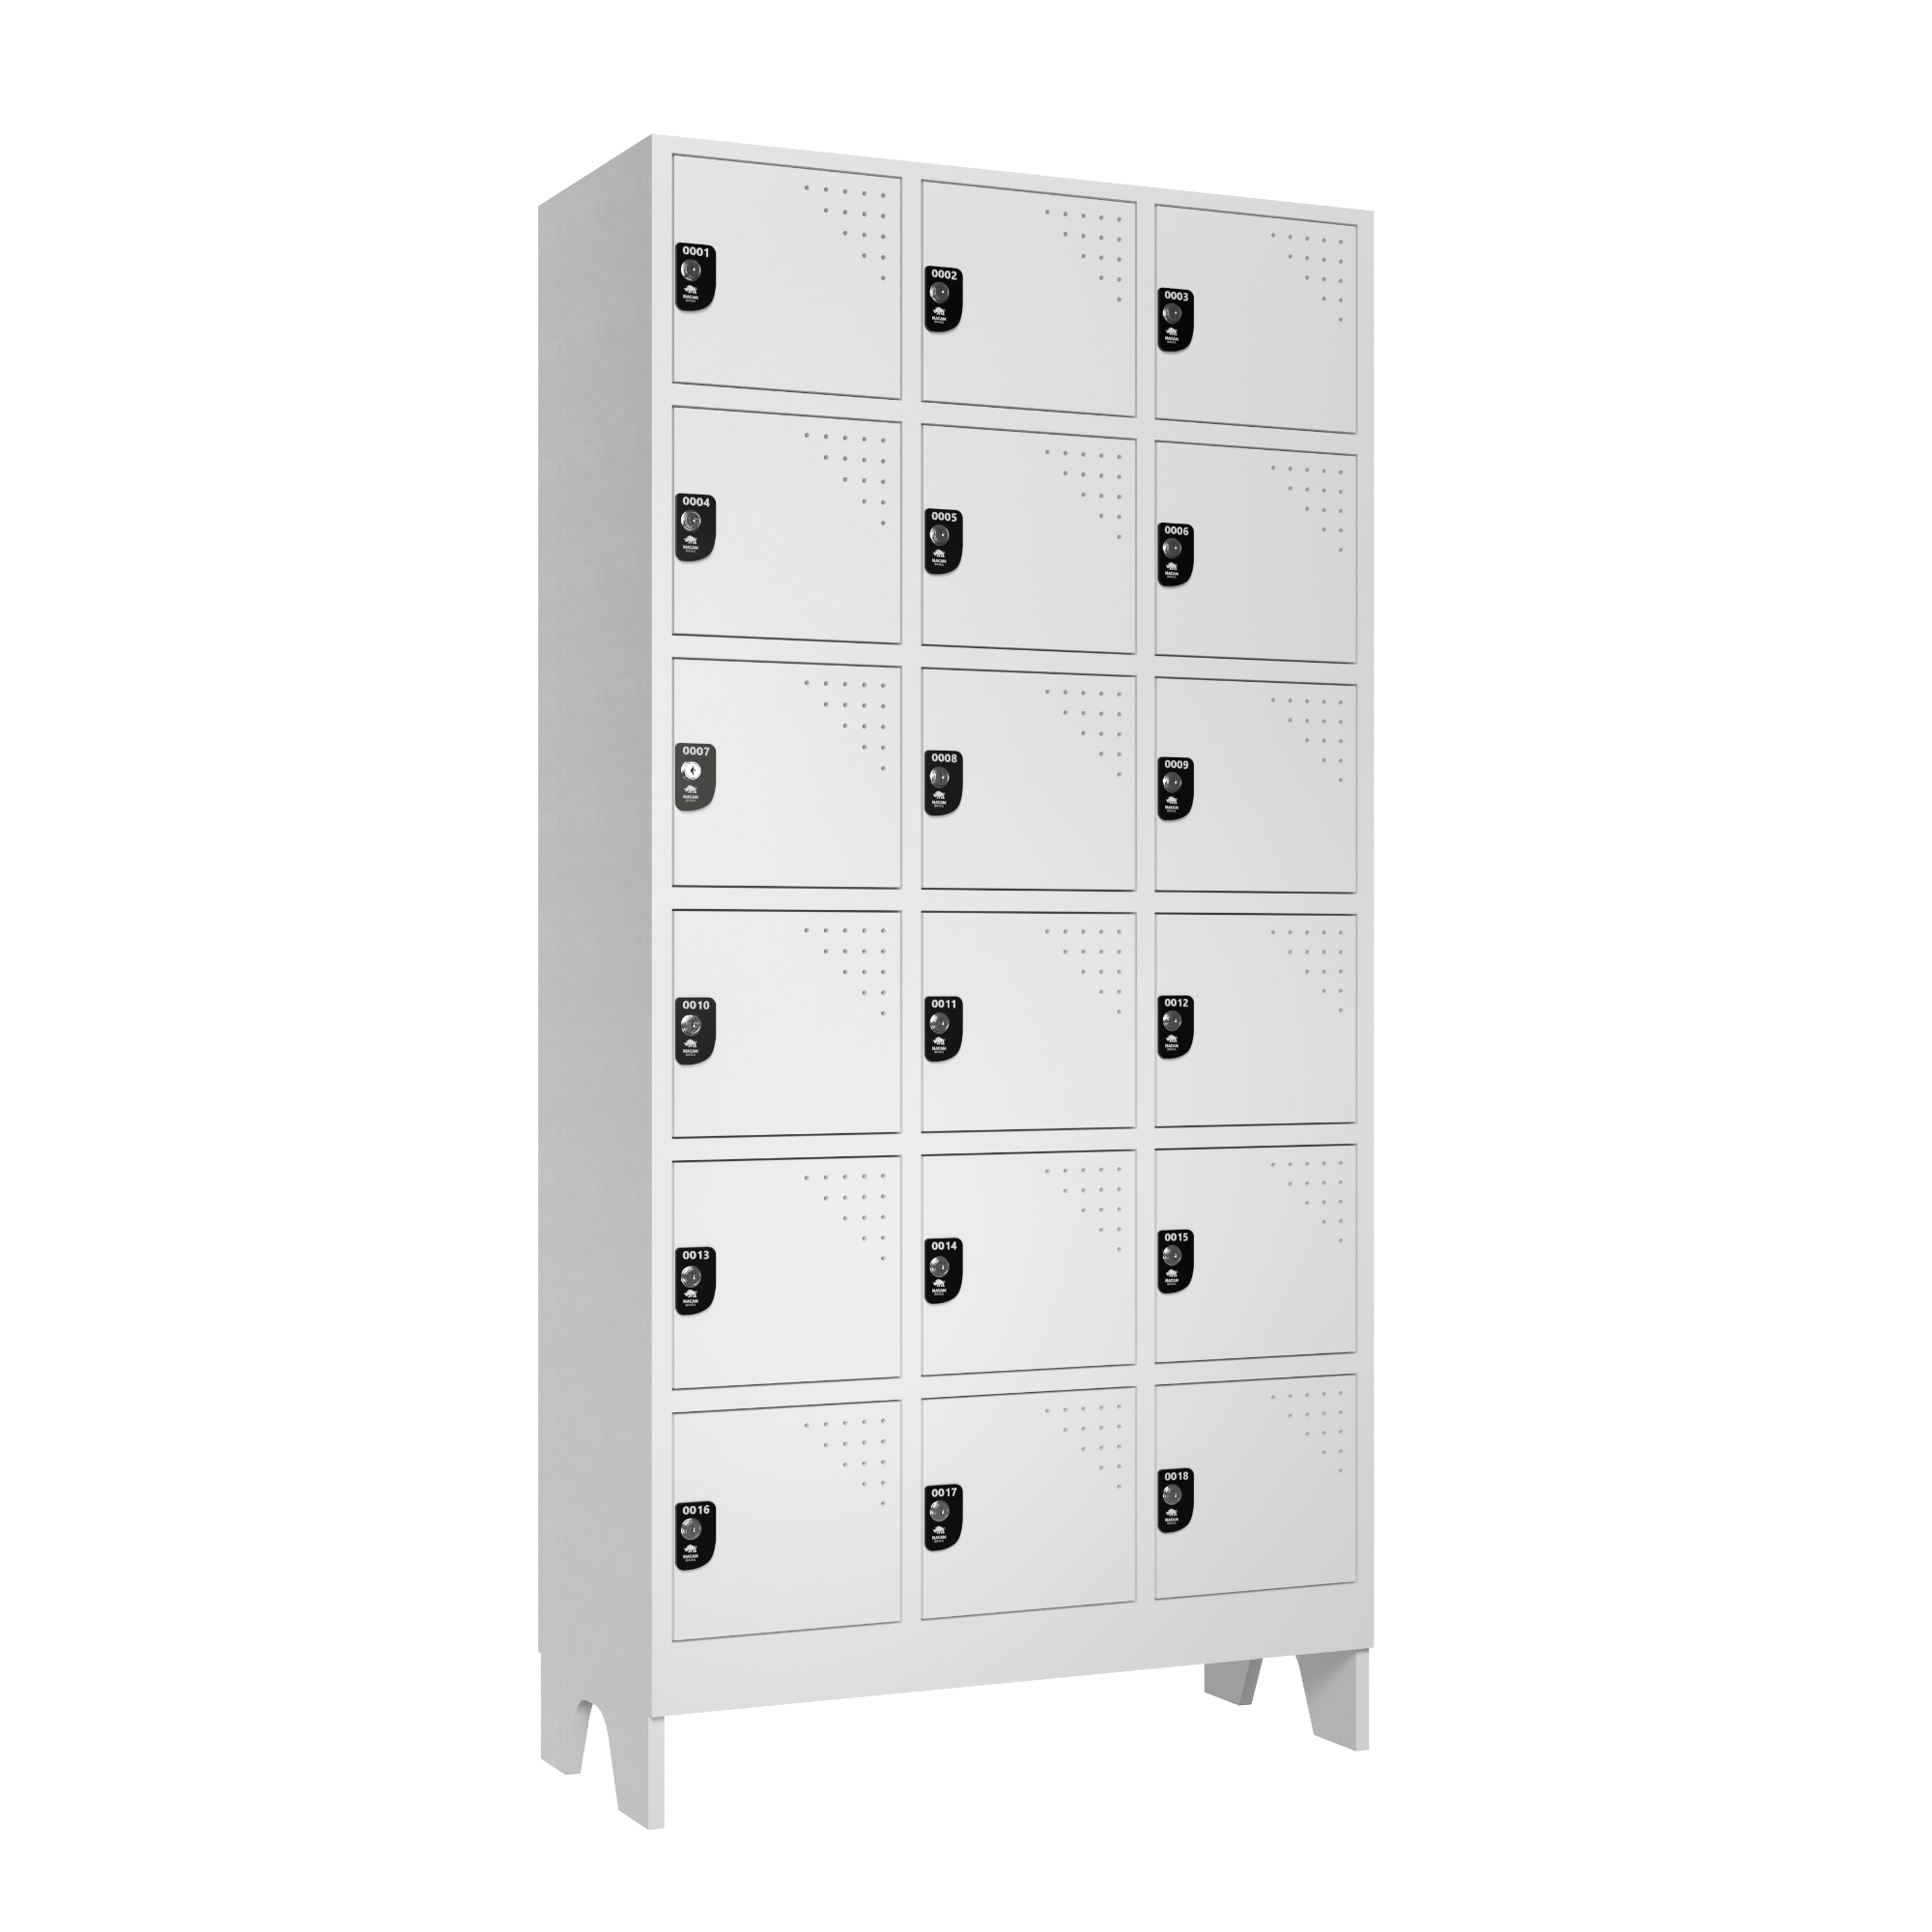 armario para vestiario multiuso 18 portas 3 colunas 6 portas por coluna lateral fechado 2000x2000 1